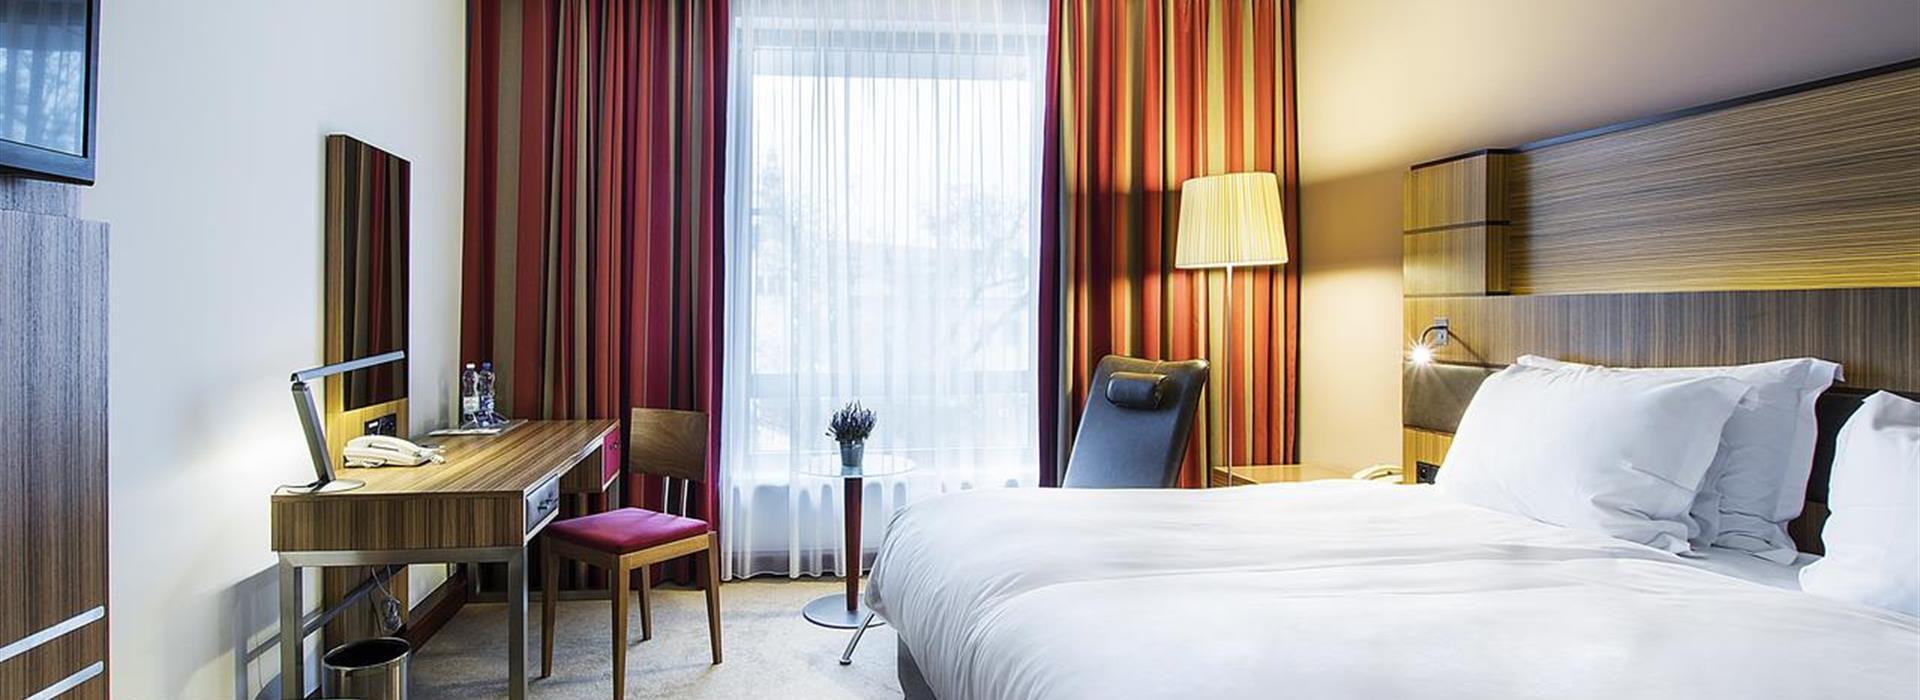 radisson-blu-hotel-krakow